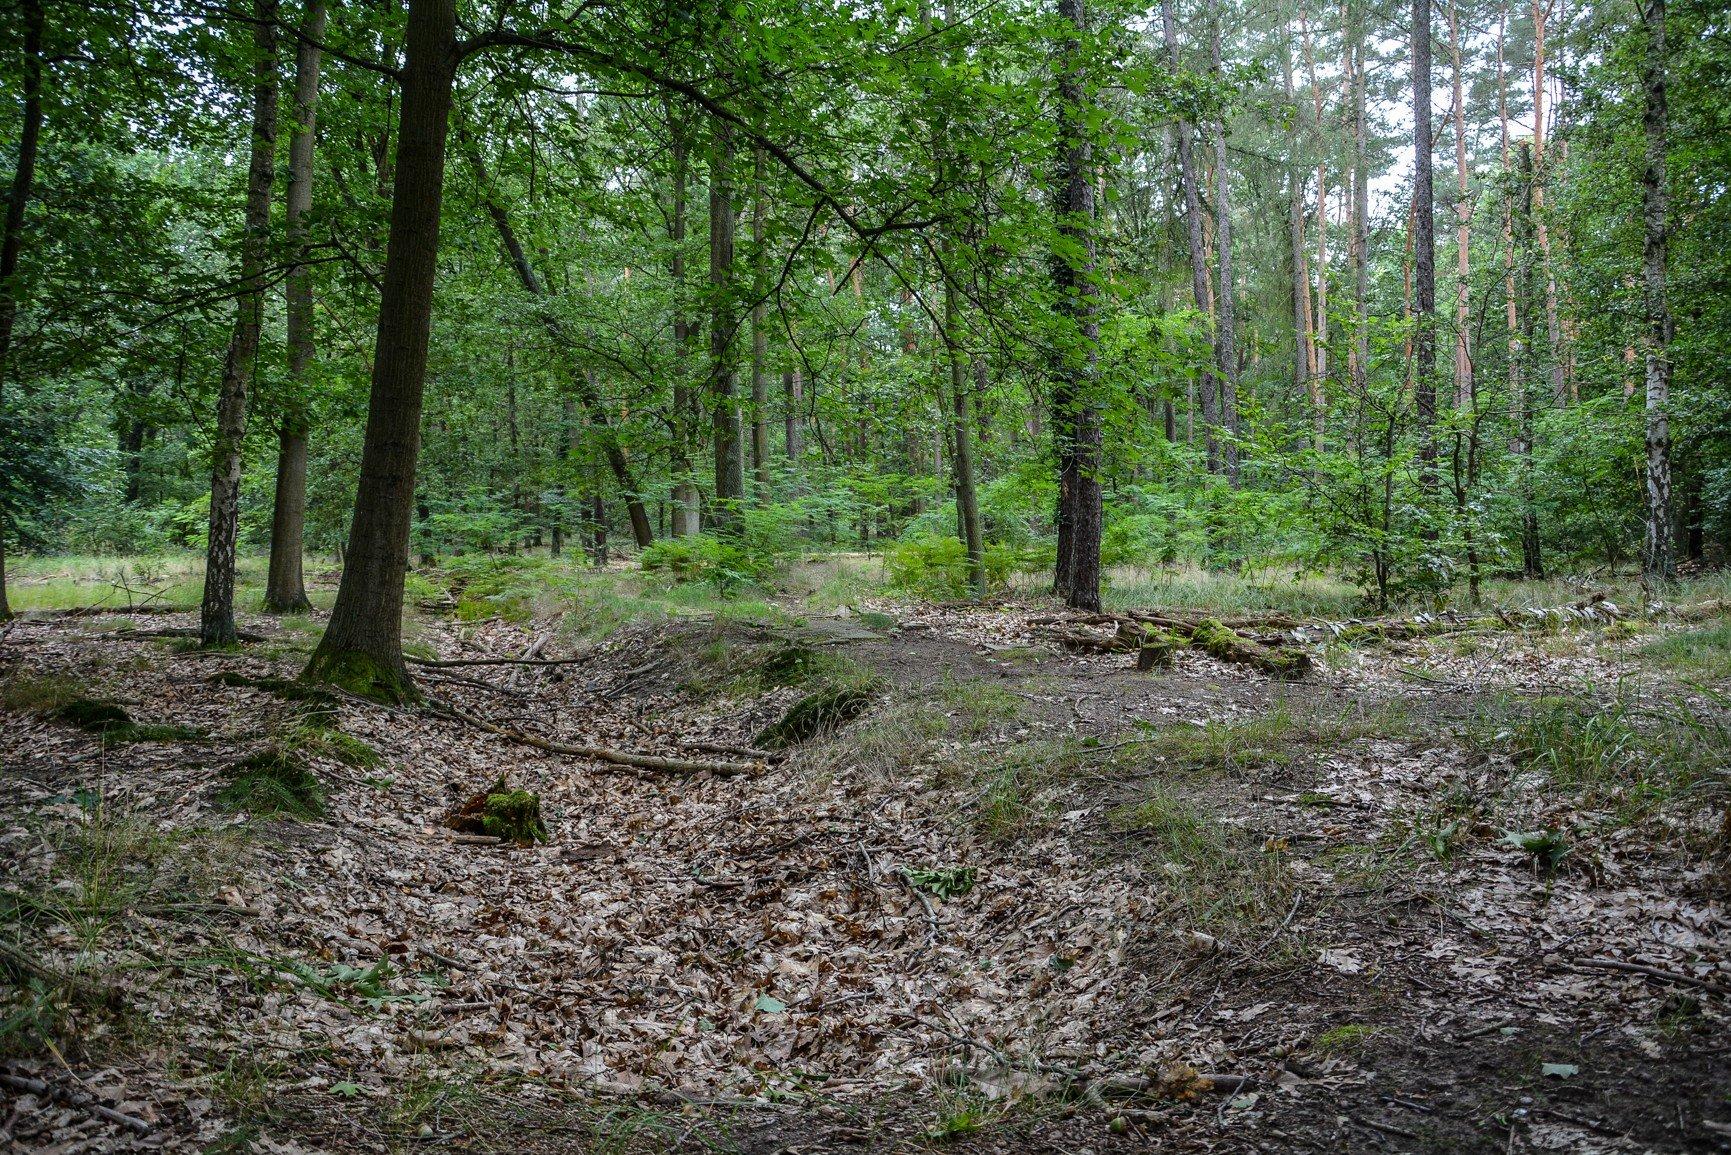 wald avus südkruve modell berlin charlottenburg lost places urbex abandoned berlin